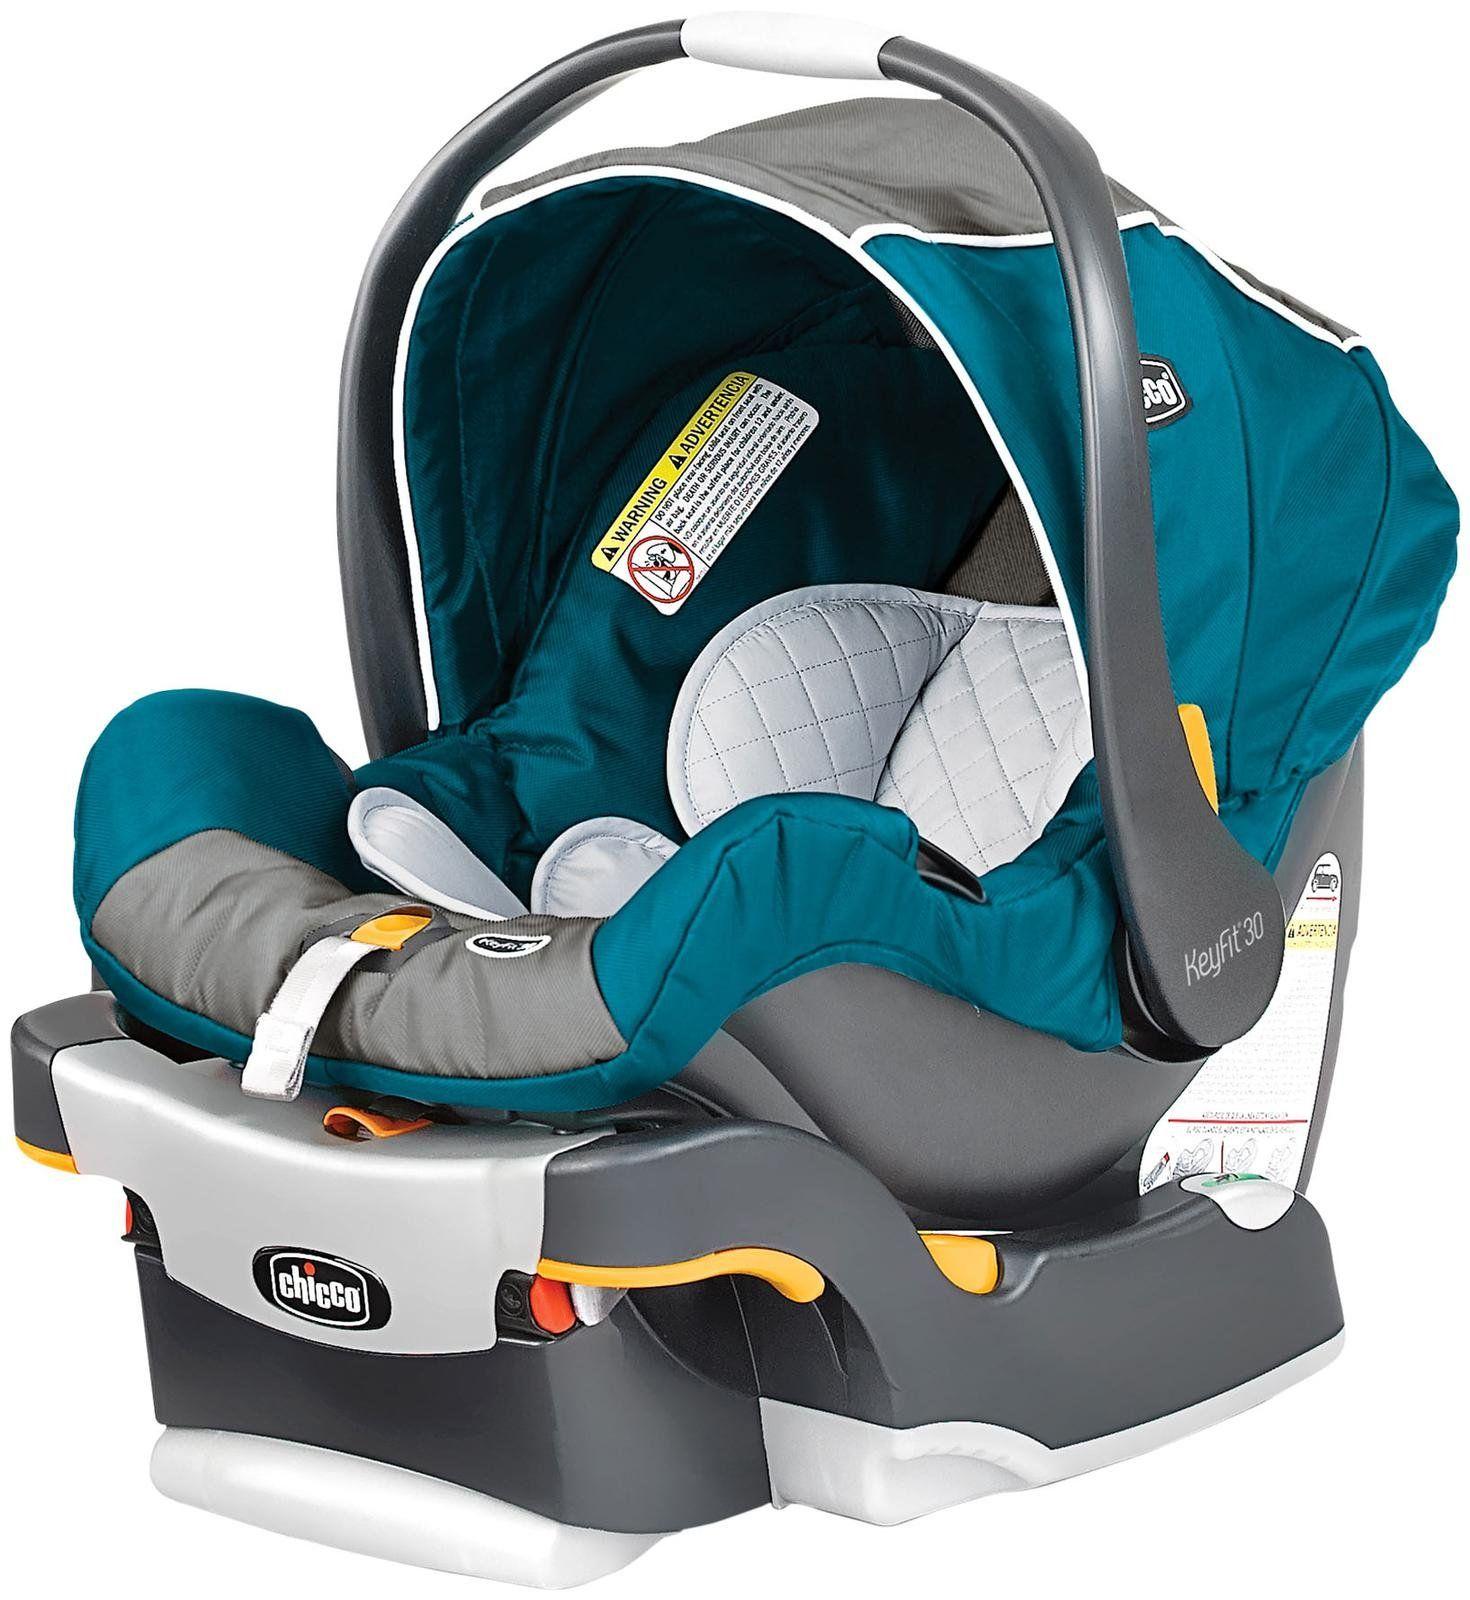 Chicco Keyfit 30 Infant Car Seat - Polaris   Baby, kind   Pinterest ...